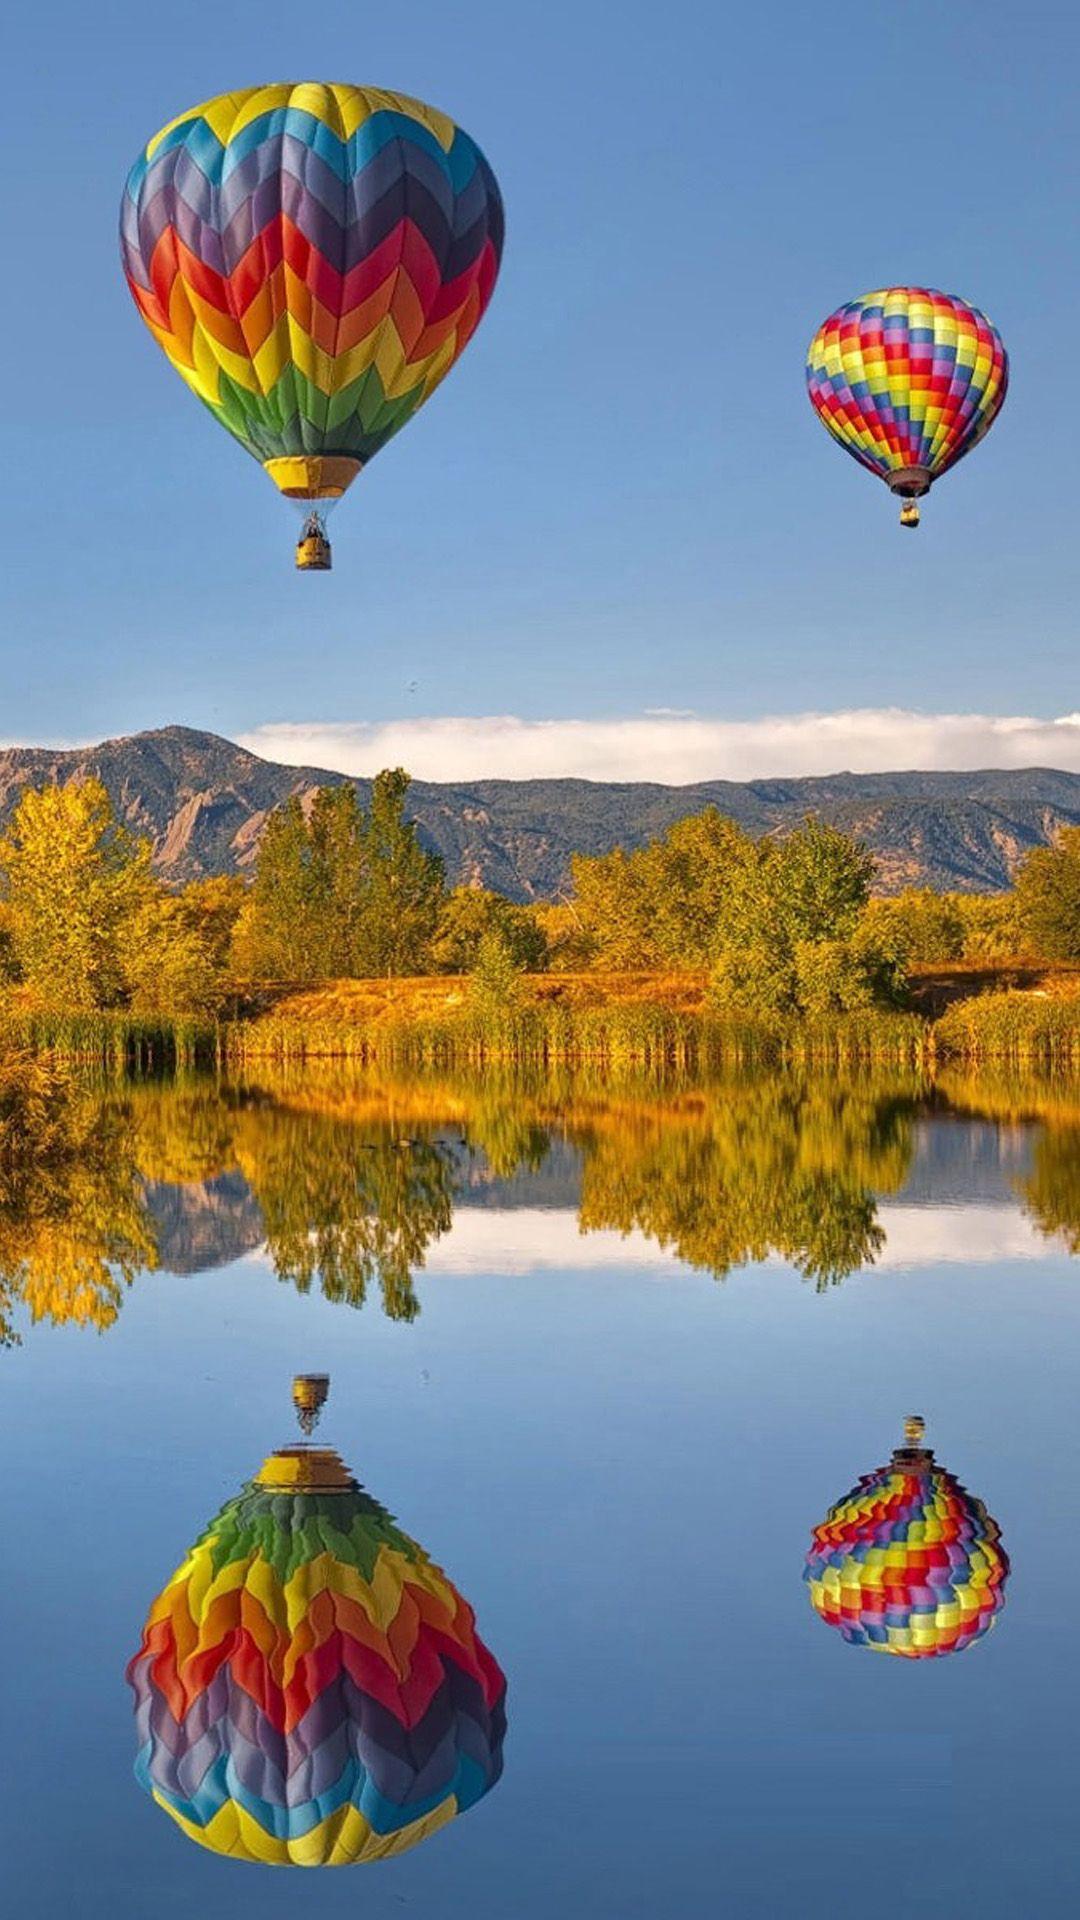 Hot Air Balloon Iphone Wallpapers Wallpaper Cave